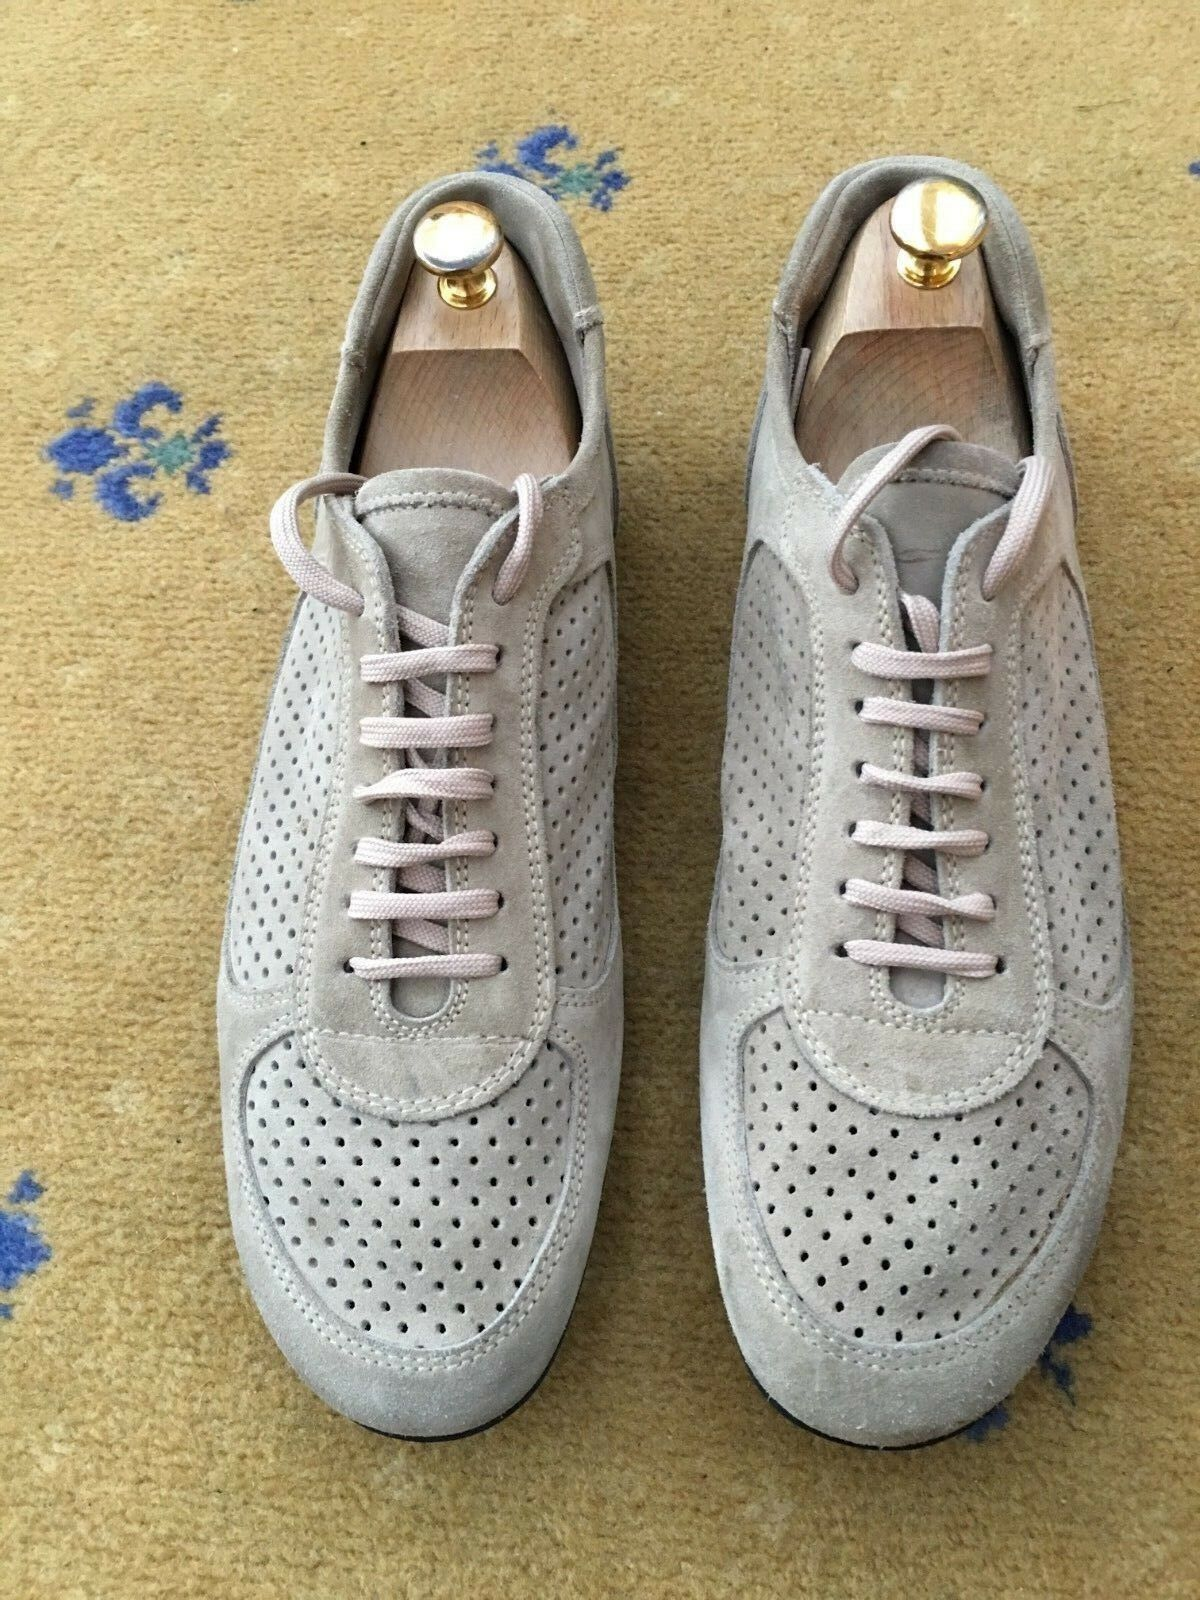 Miu Miu de Prada homme beige en Daim Baskets Baskets Chaussures UK 10 US 11 EU 44